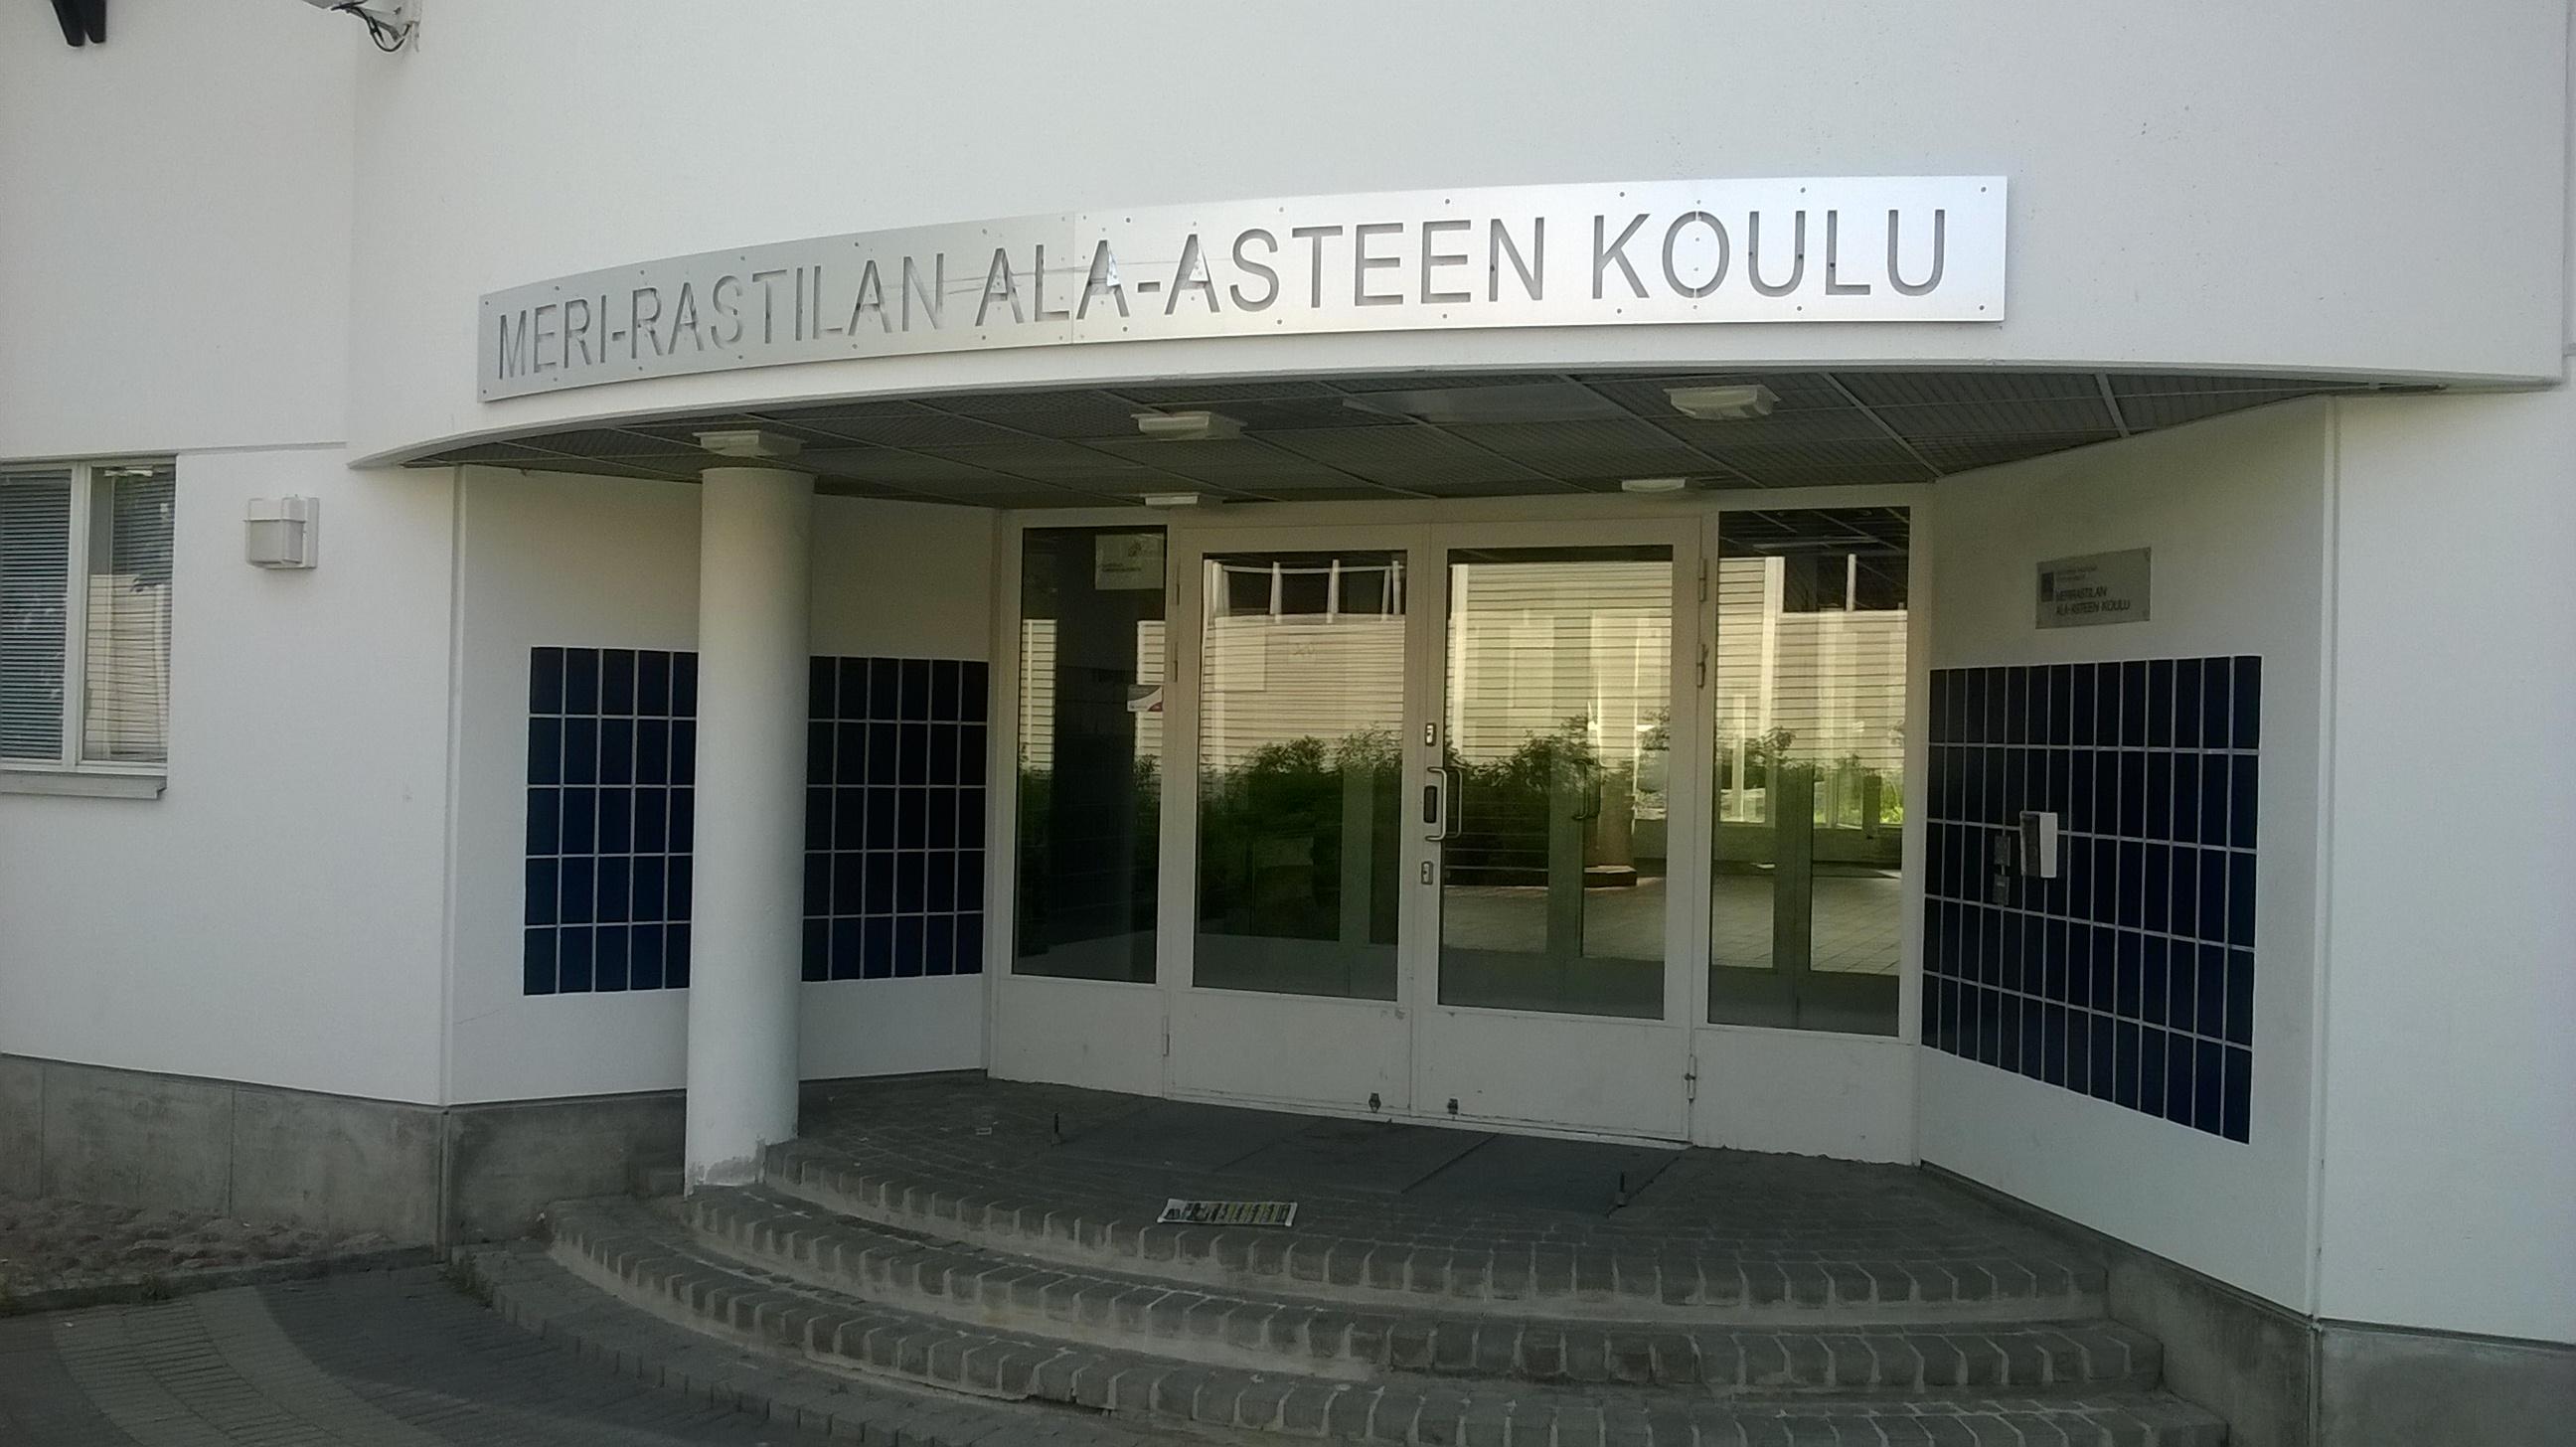 Merilahden Koulu